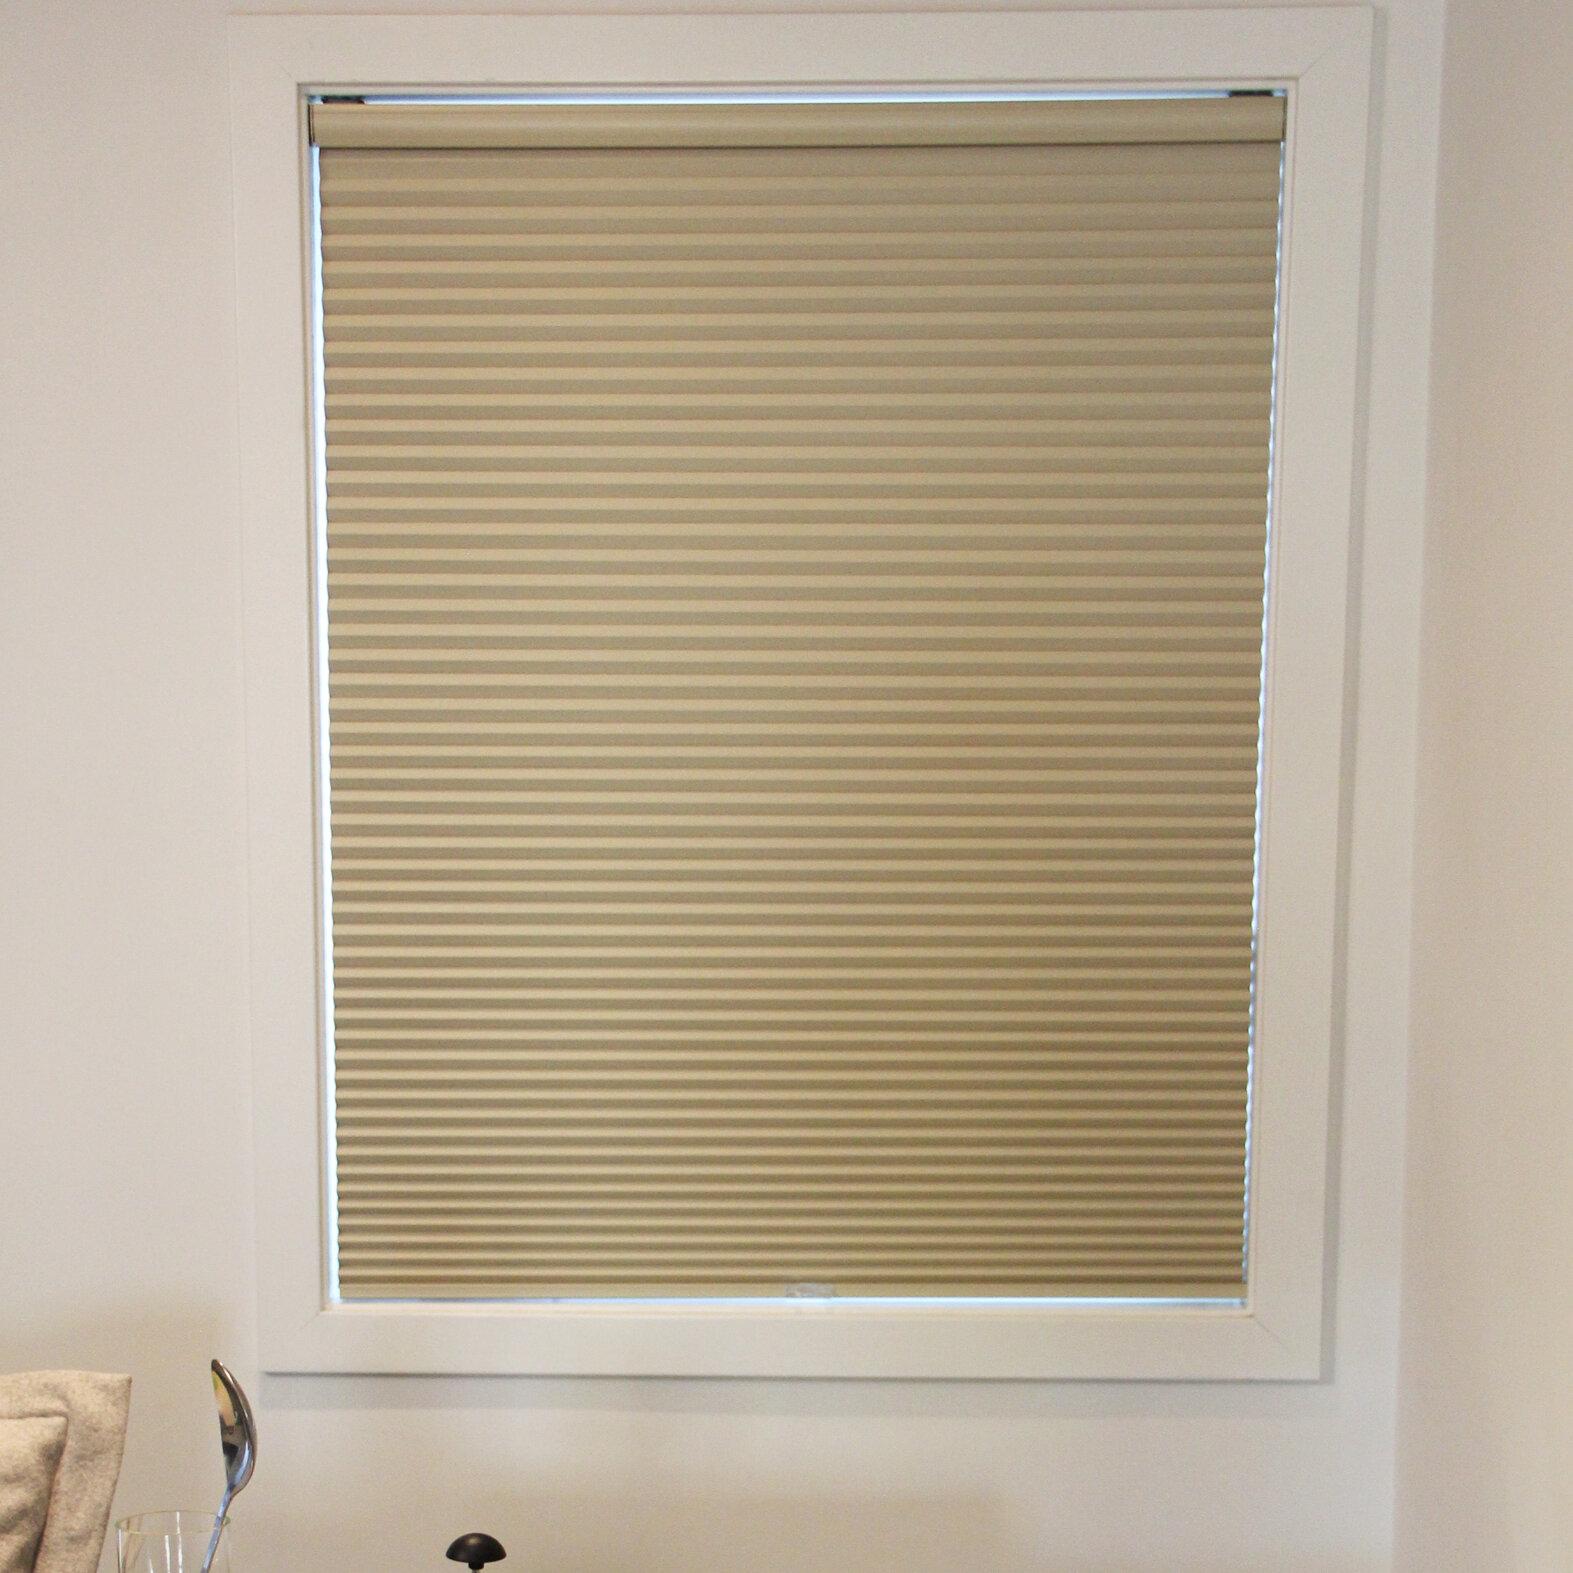 window itm roman ebay bamboo shade arlo rustique cordless blinds petite